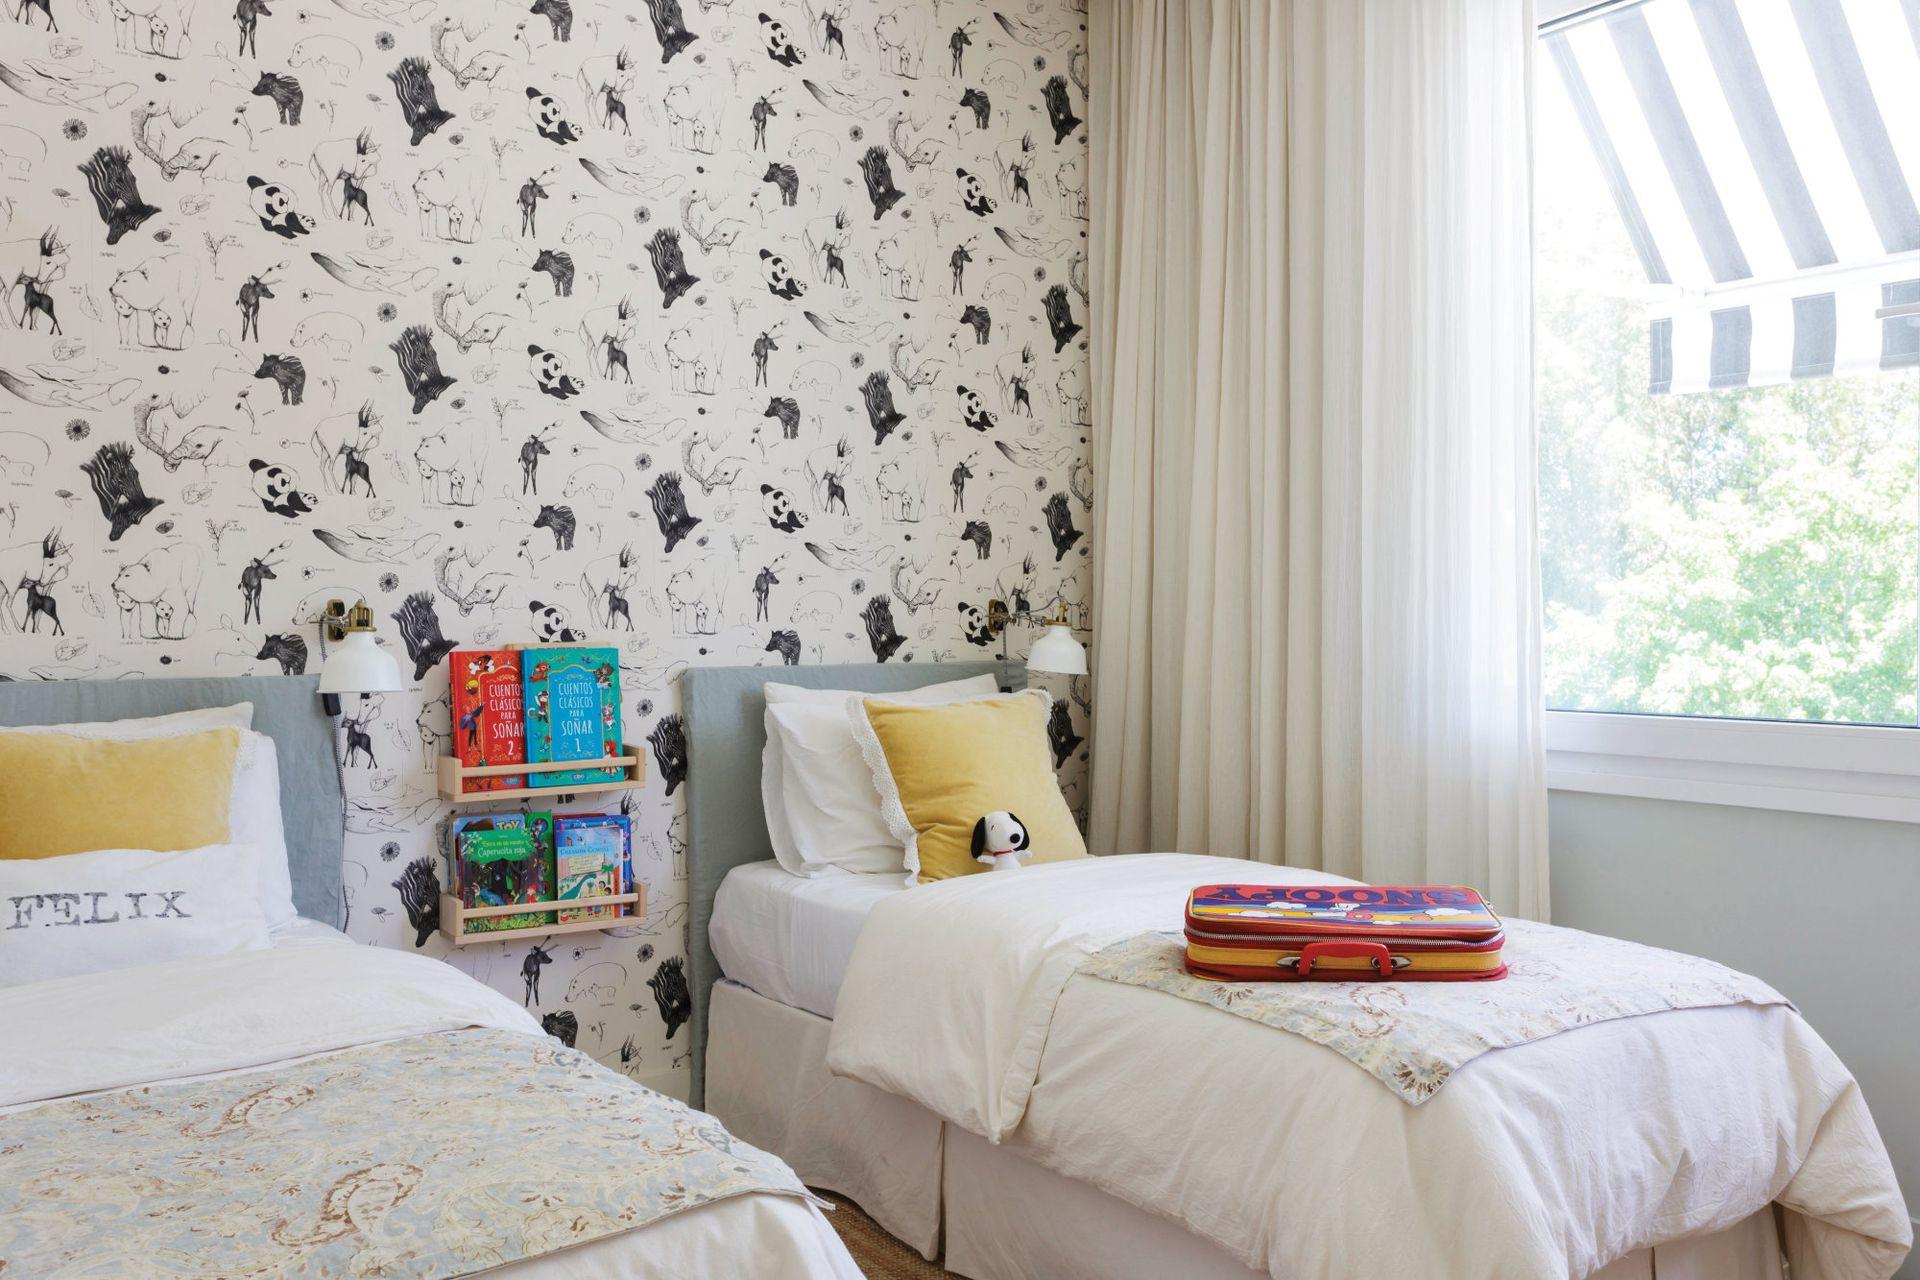 Wallpaper con motivos de animales (Picnic). Respaldos de madera con funda de lino belga color celadón. Funda de lienzo de algodón crudo (Zara Home). Mantas de lino estampado (ABC Home). Estantes para apoyar libros (Ikea).